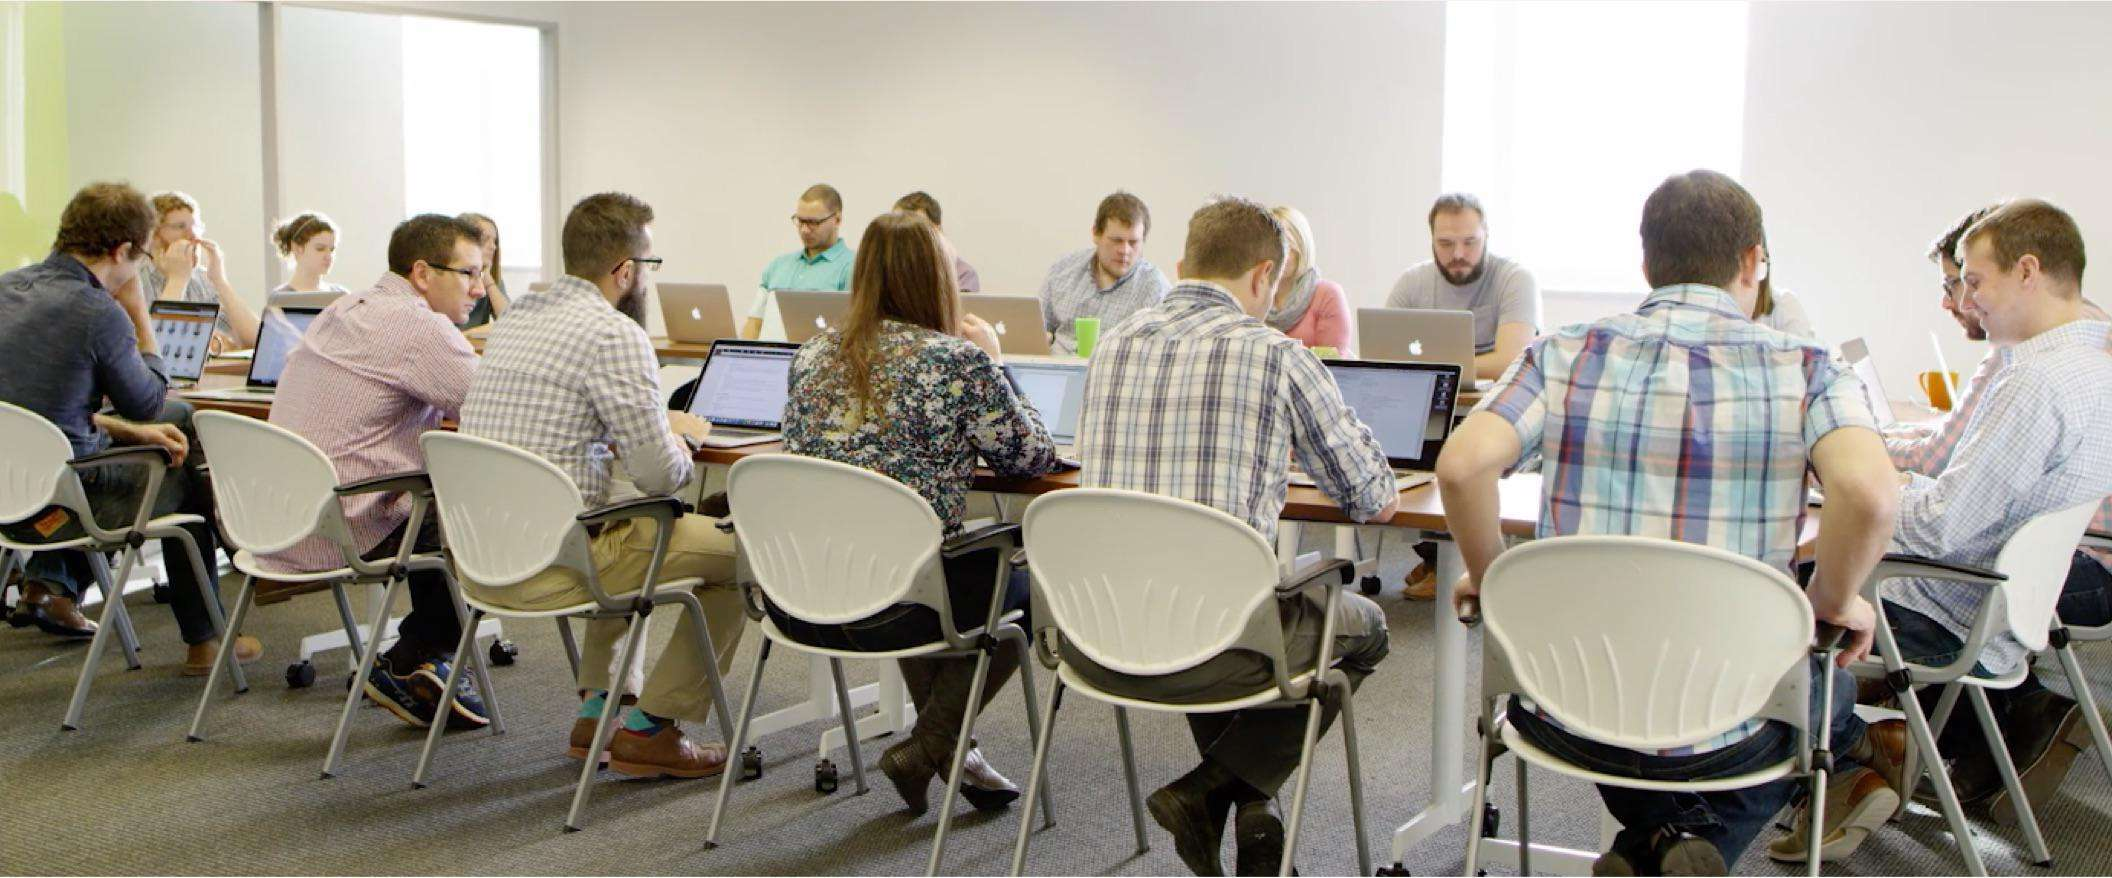 cincinnati website developer team